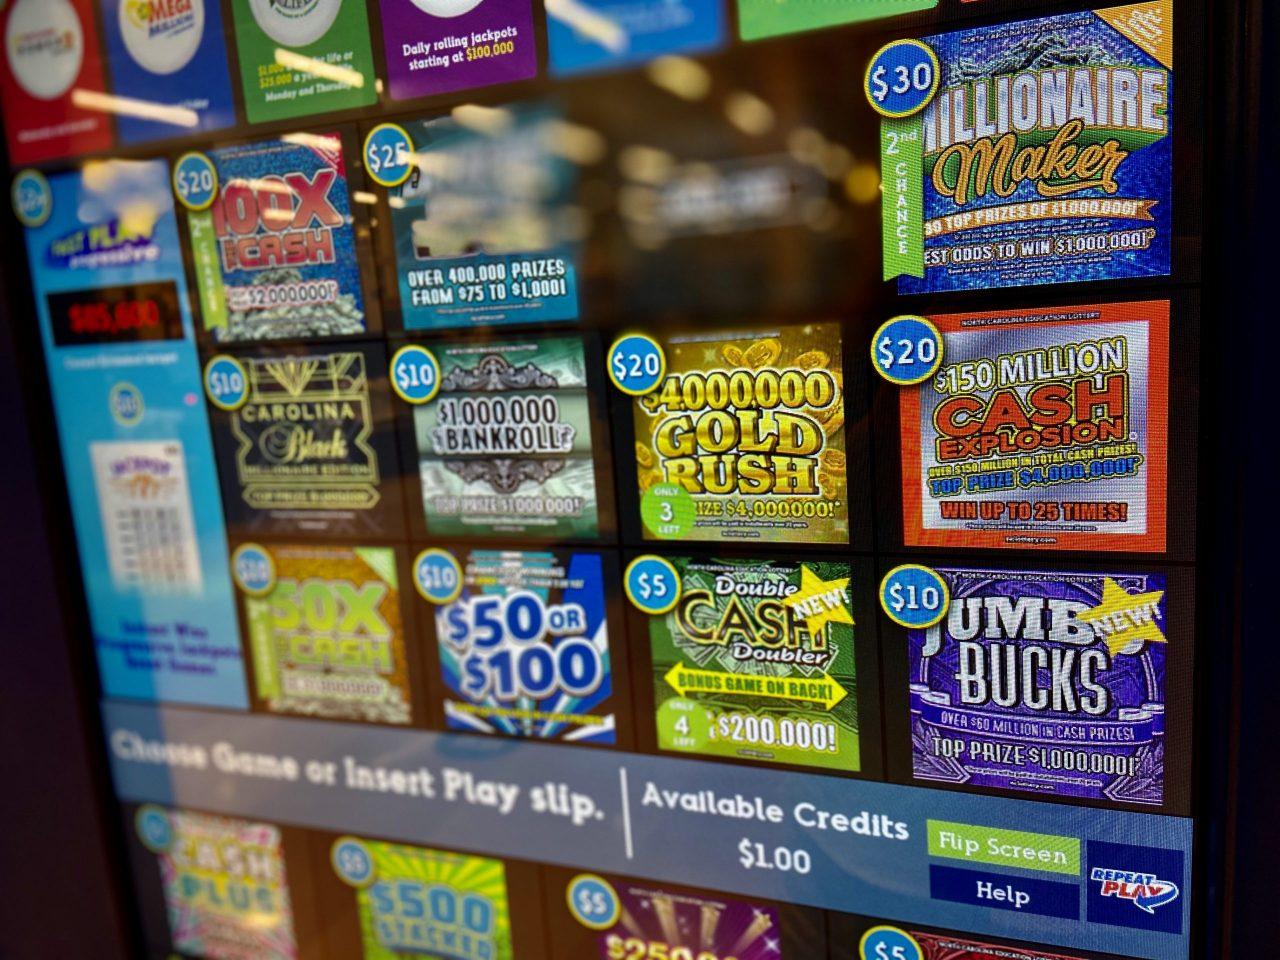 Bagaimana $ 20 juta keuntungan lotere disalurkan setiap tahun ke sekolah New Hanover, Brunswick, Pender